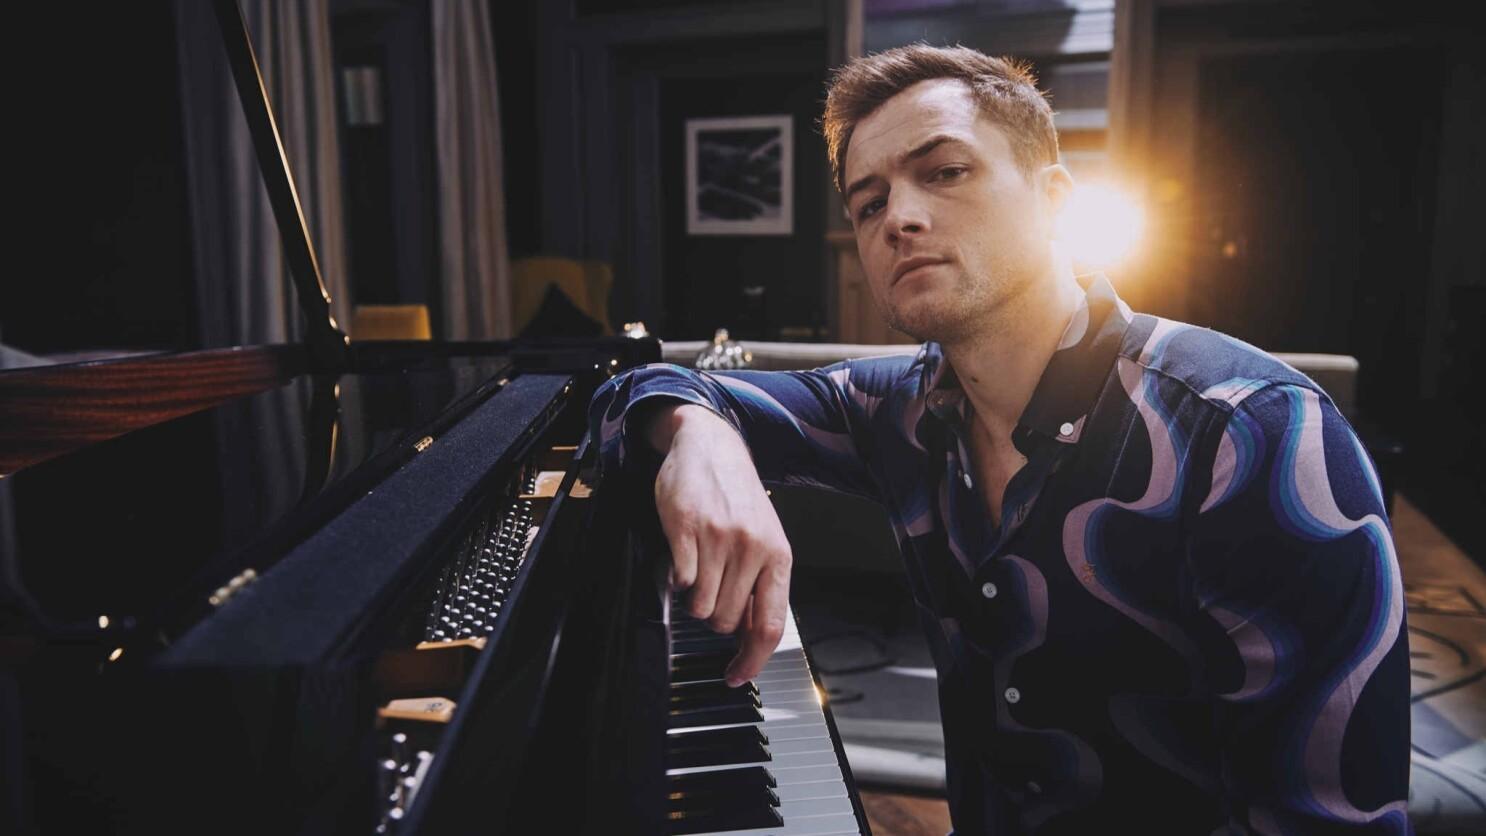 Taron Egerton channels Elton John in 'Rocketman,' and the